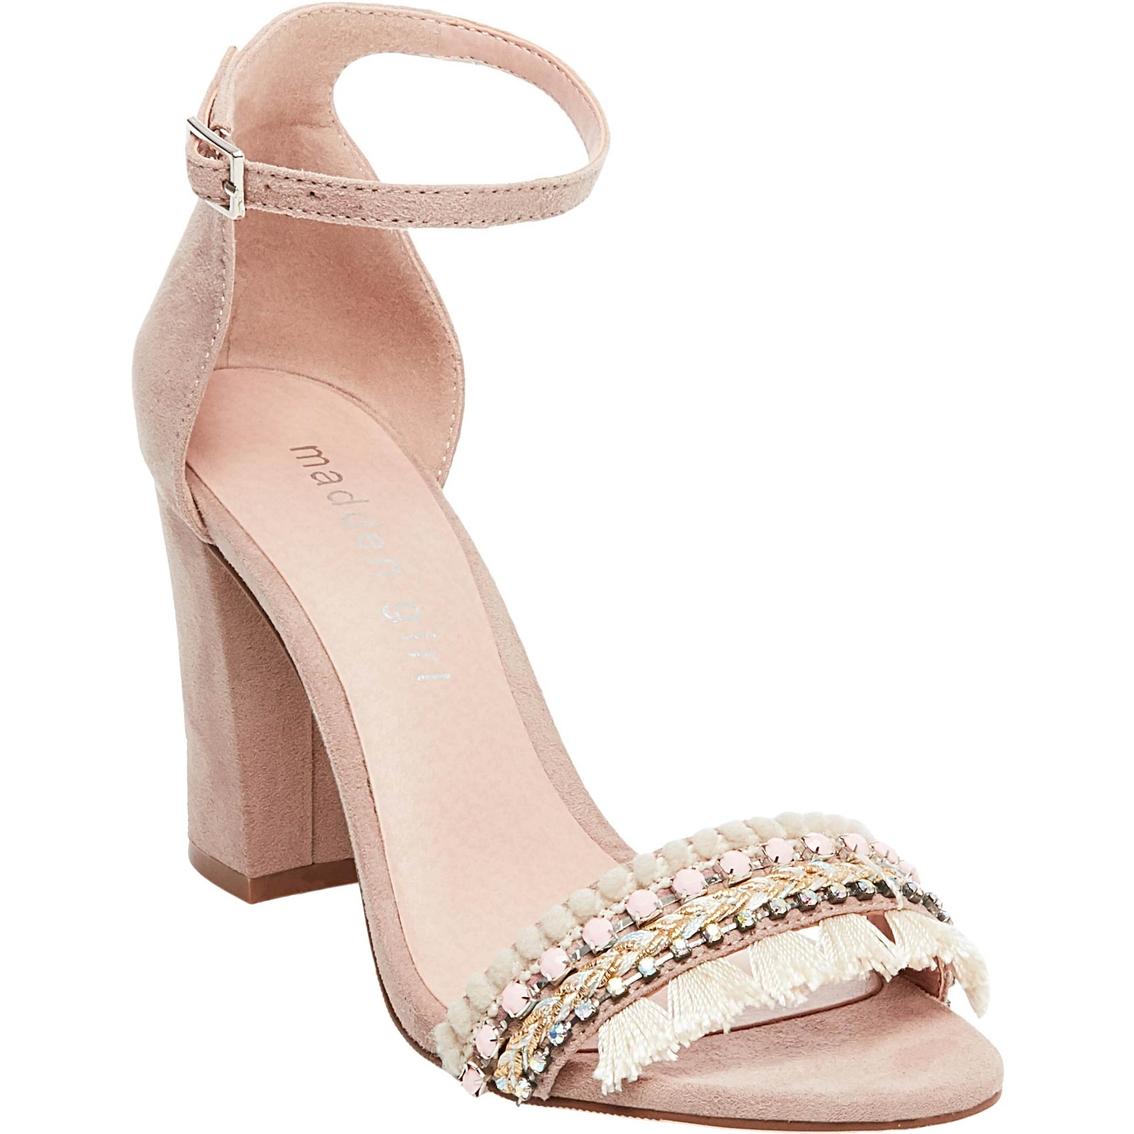 1419d5e3f Madden Girl Beellap One Band Block Heel Rhinestone Dress Sandals ...